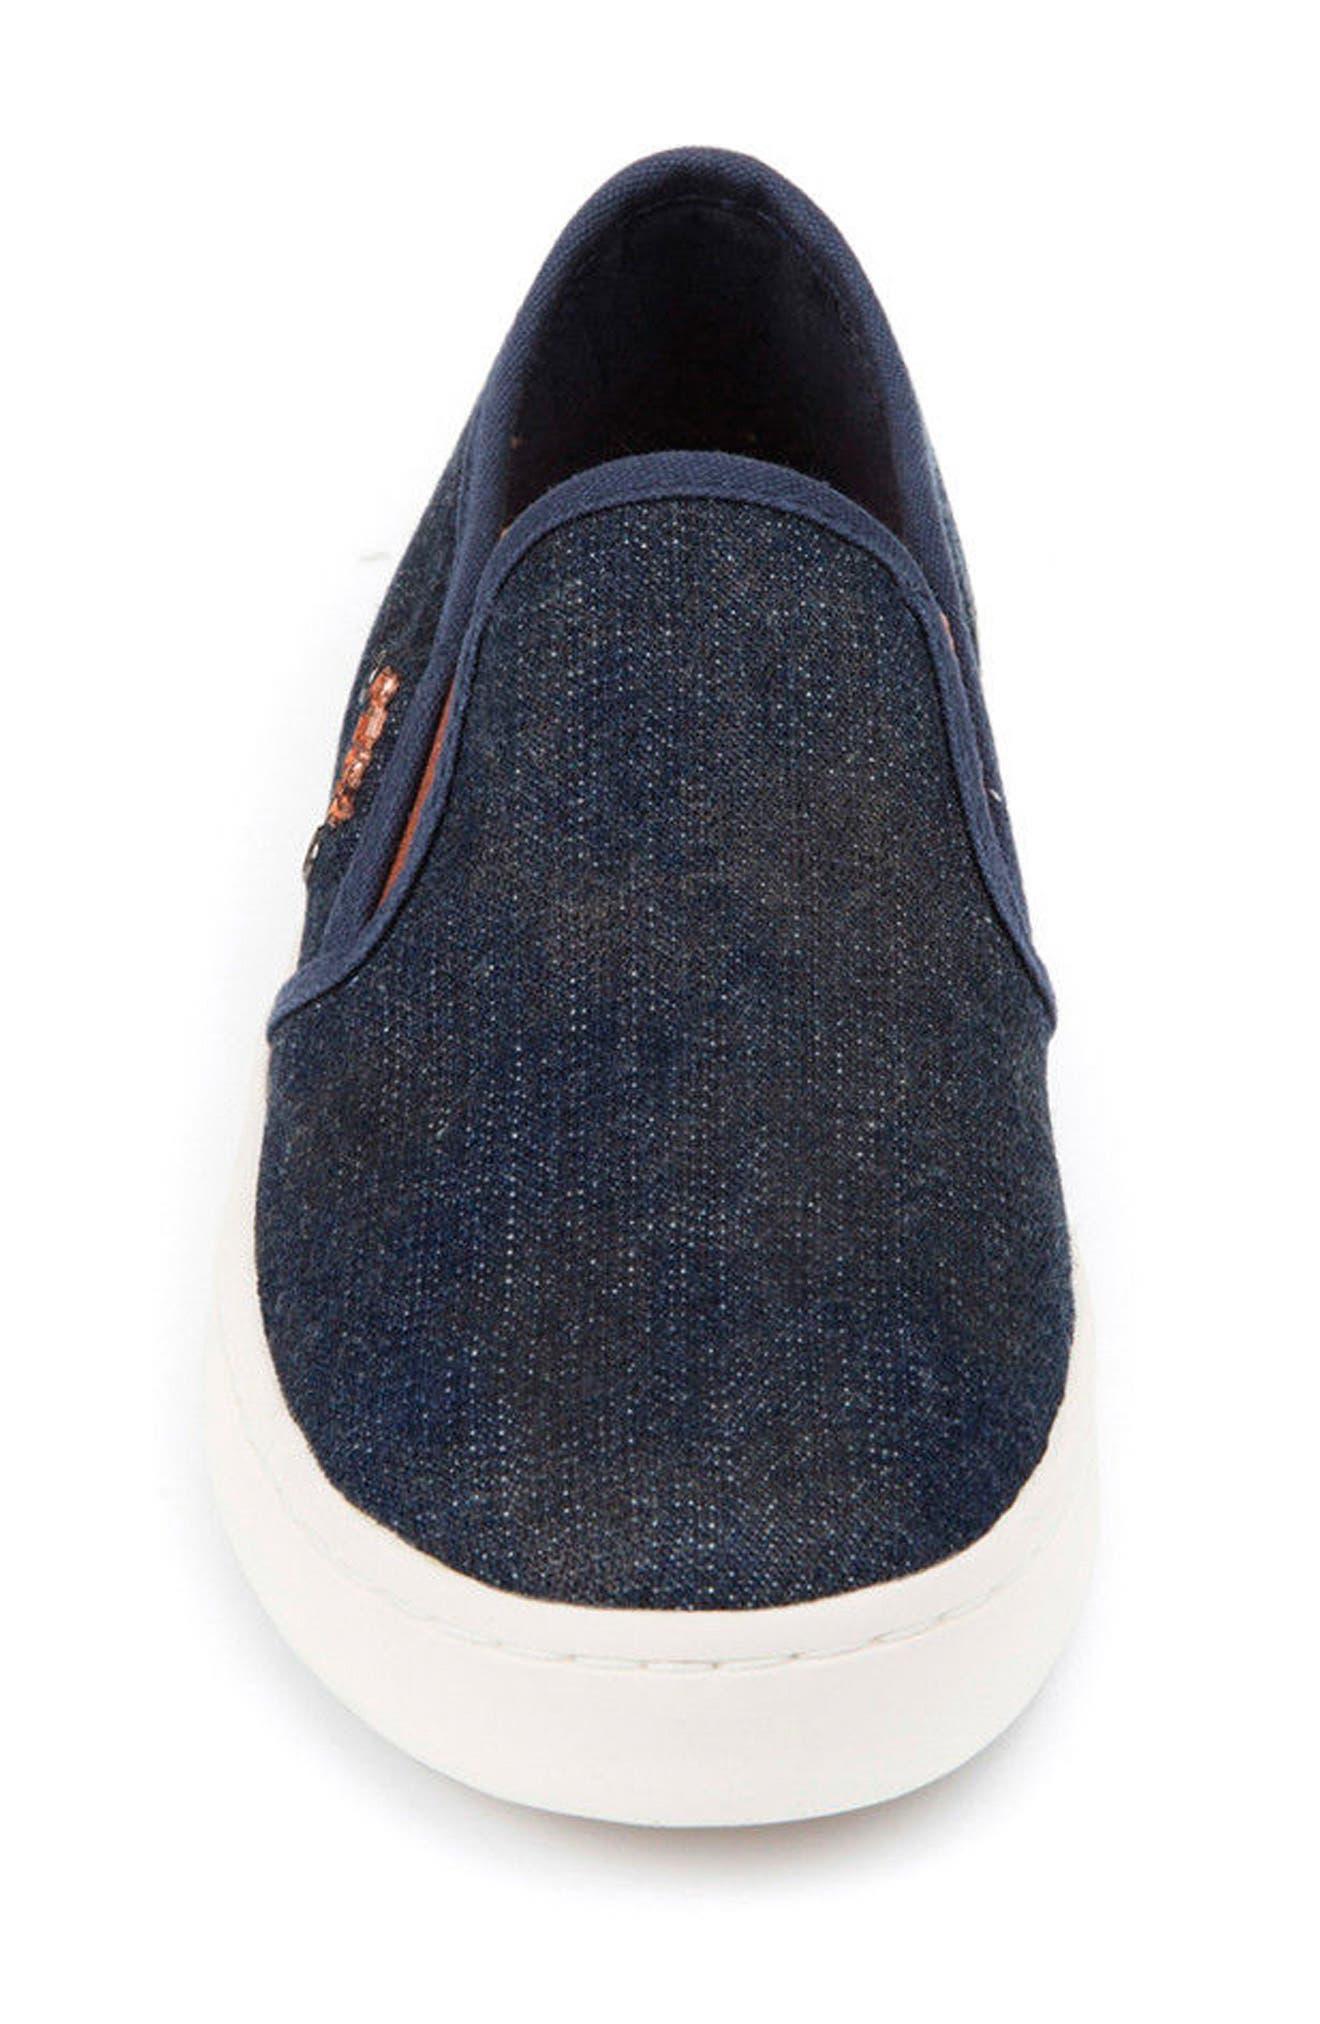 Jr Kiwi Slip-On Waterproof Sneaker,                             Alternate thumbnail 4, color,                             JEANS